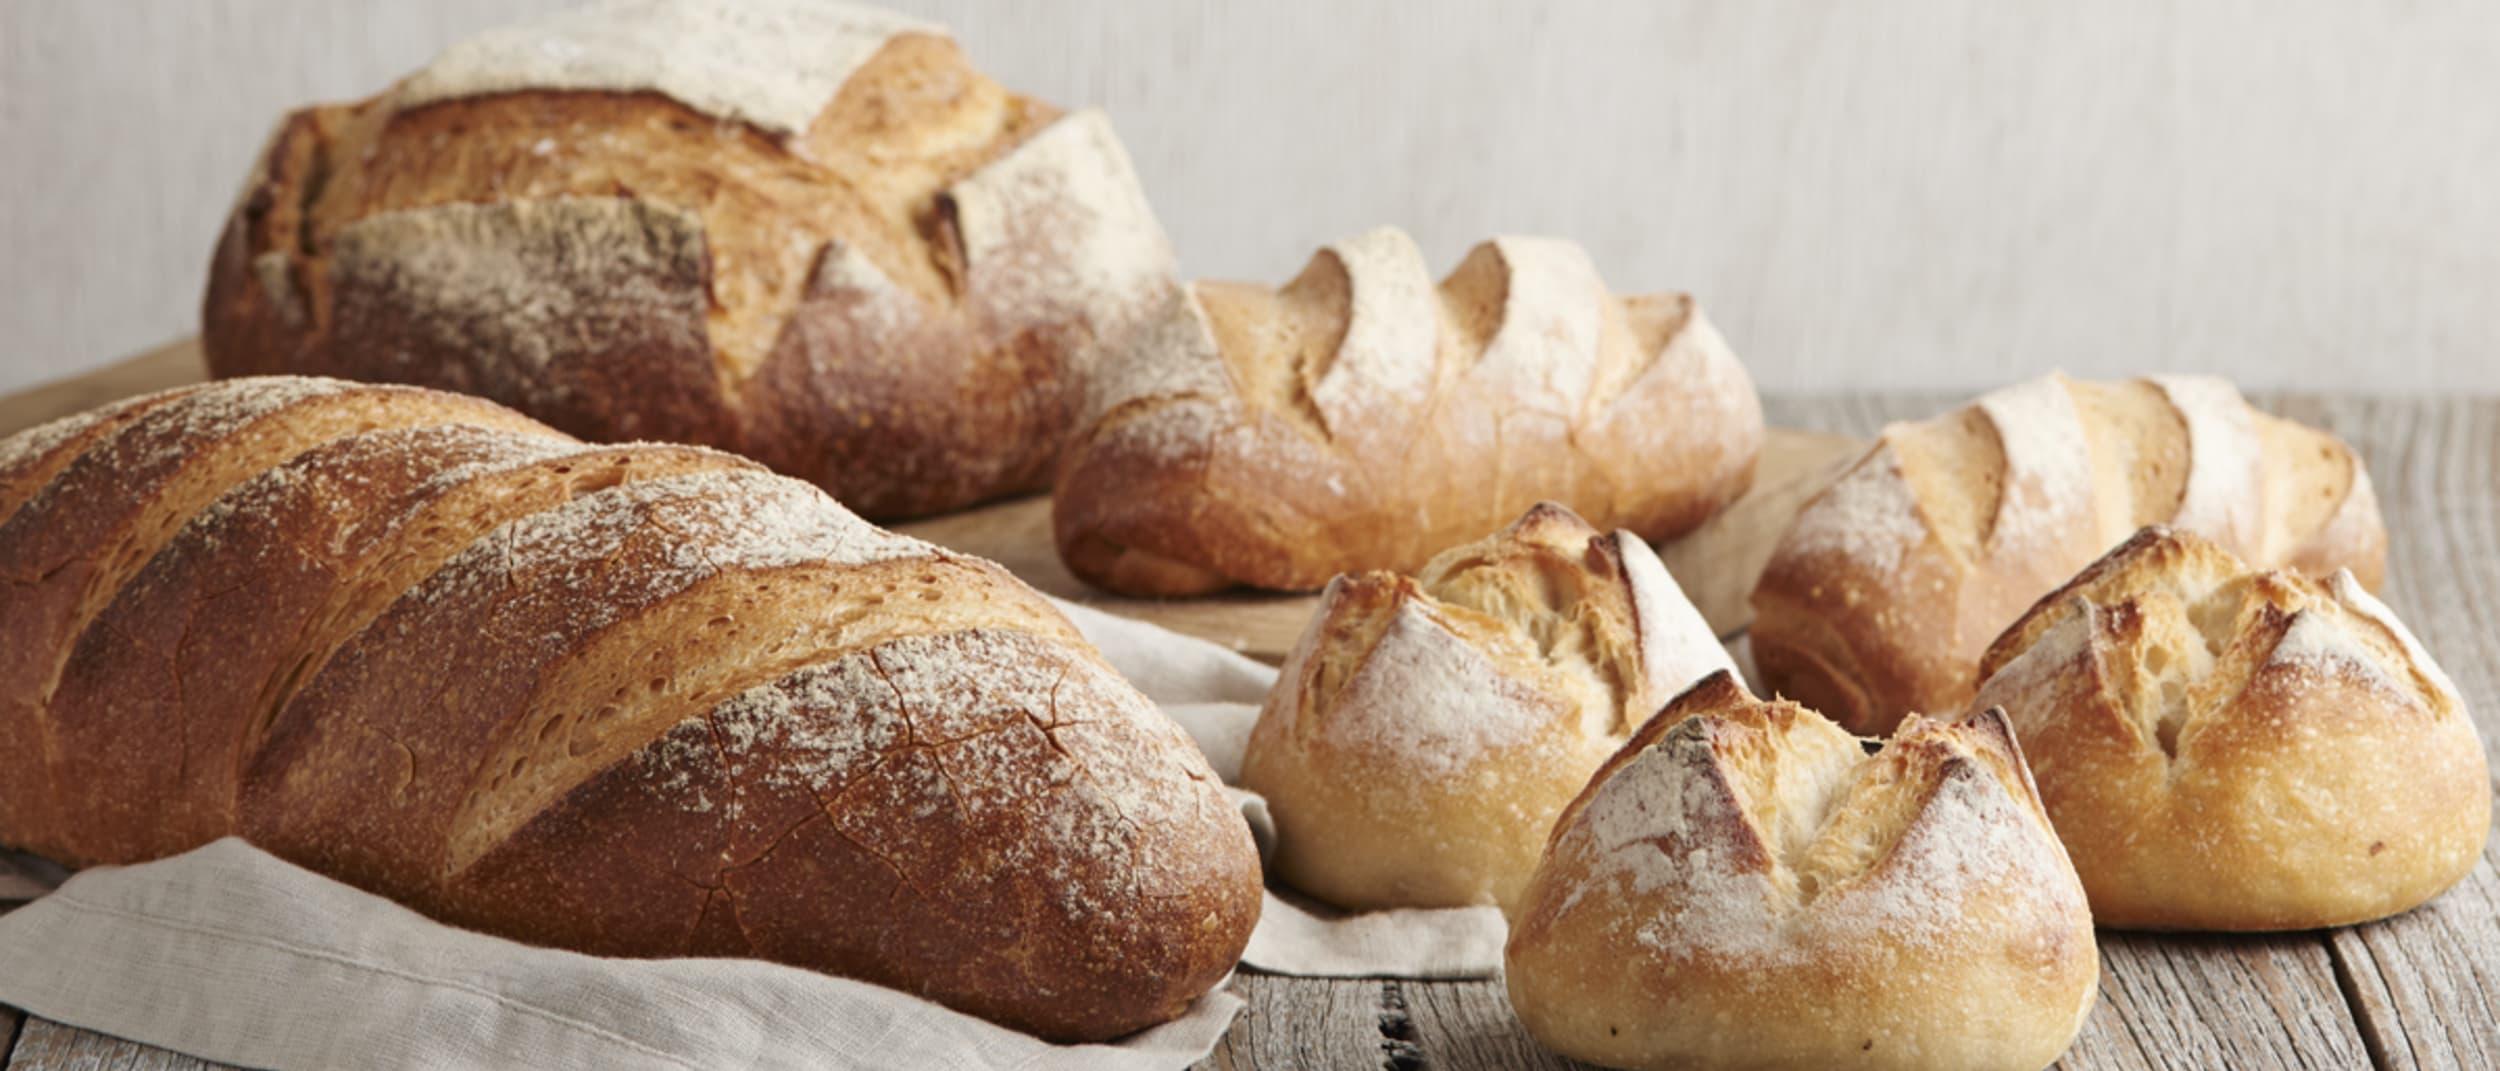 Bakers Delight: Apple & cinnamon loaf $6.50